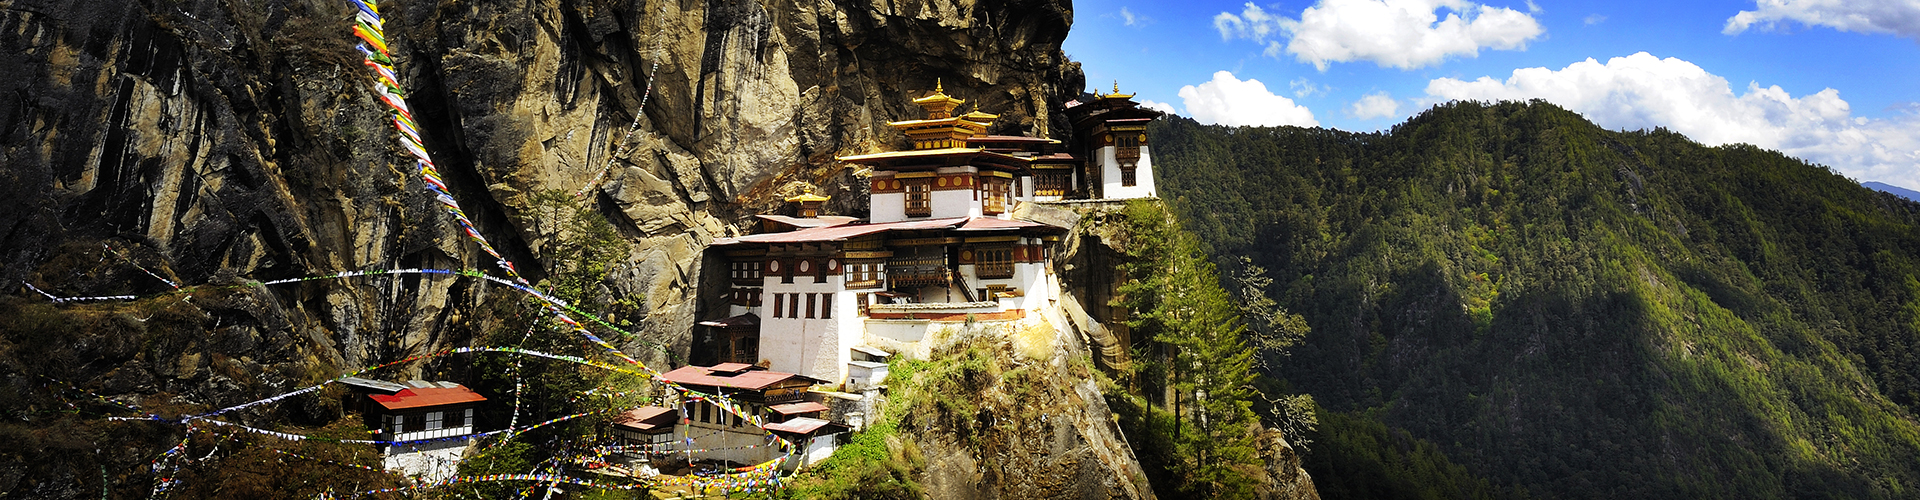 Nepal, Bhutan and Tibet